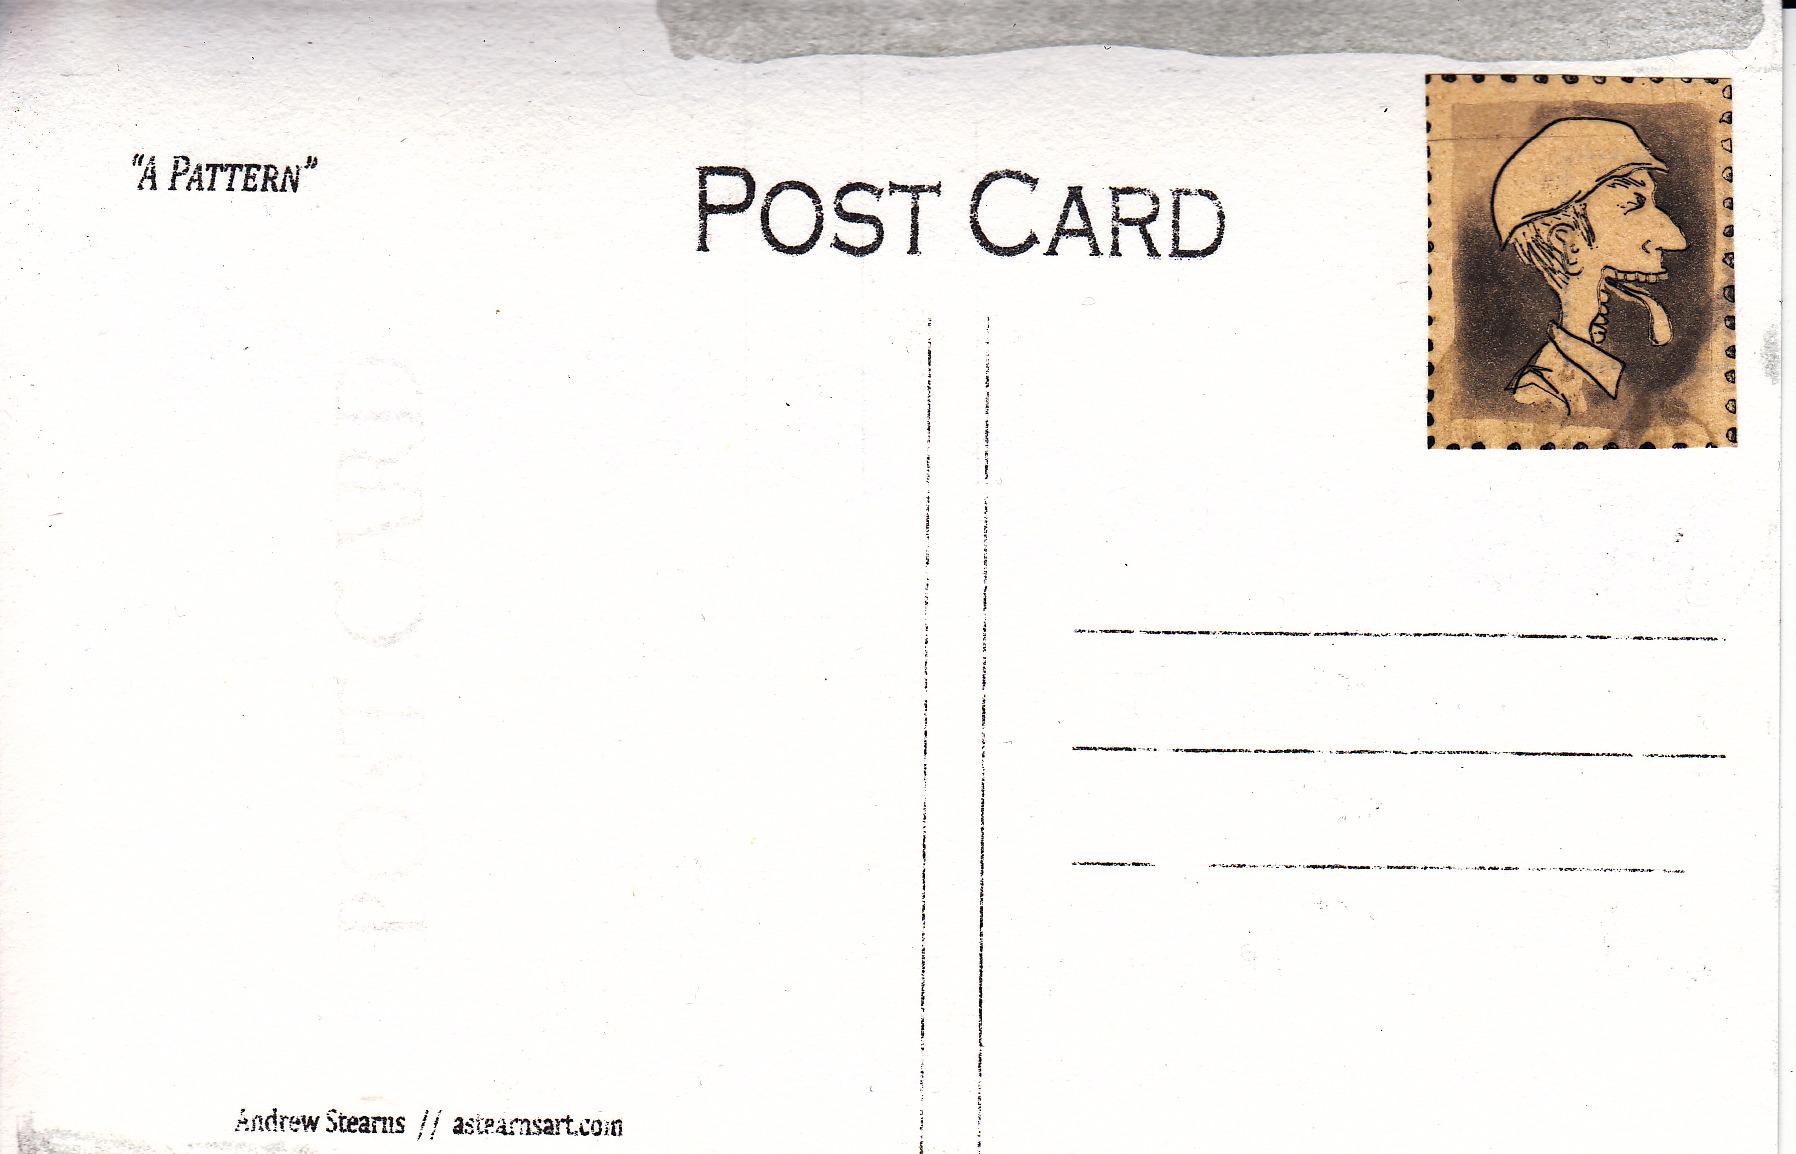 Postcard_0010.jpg